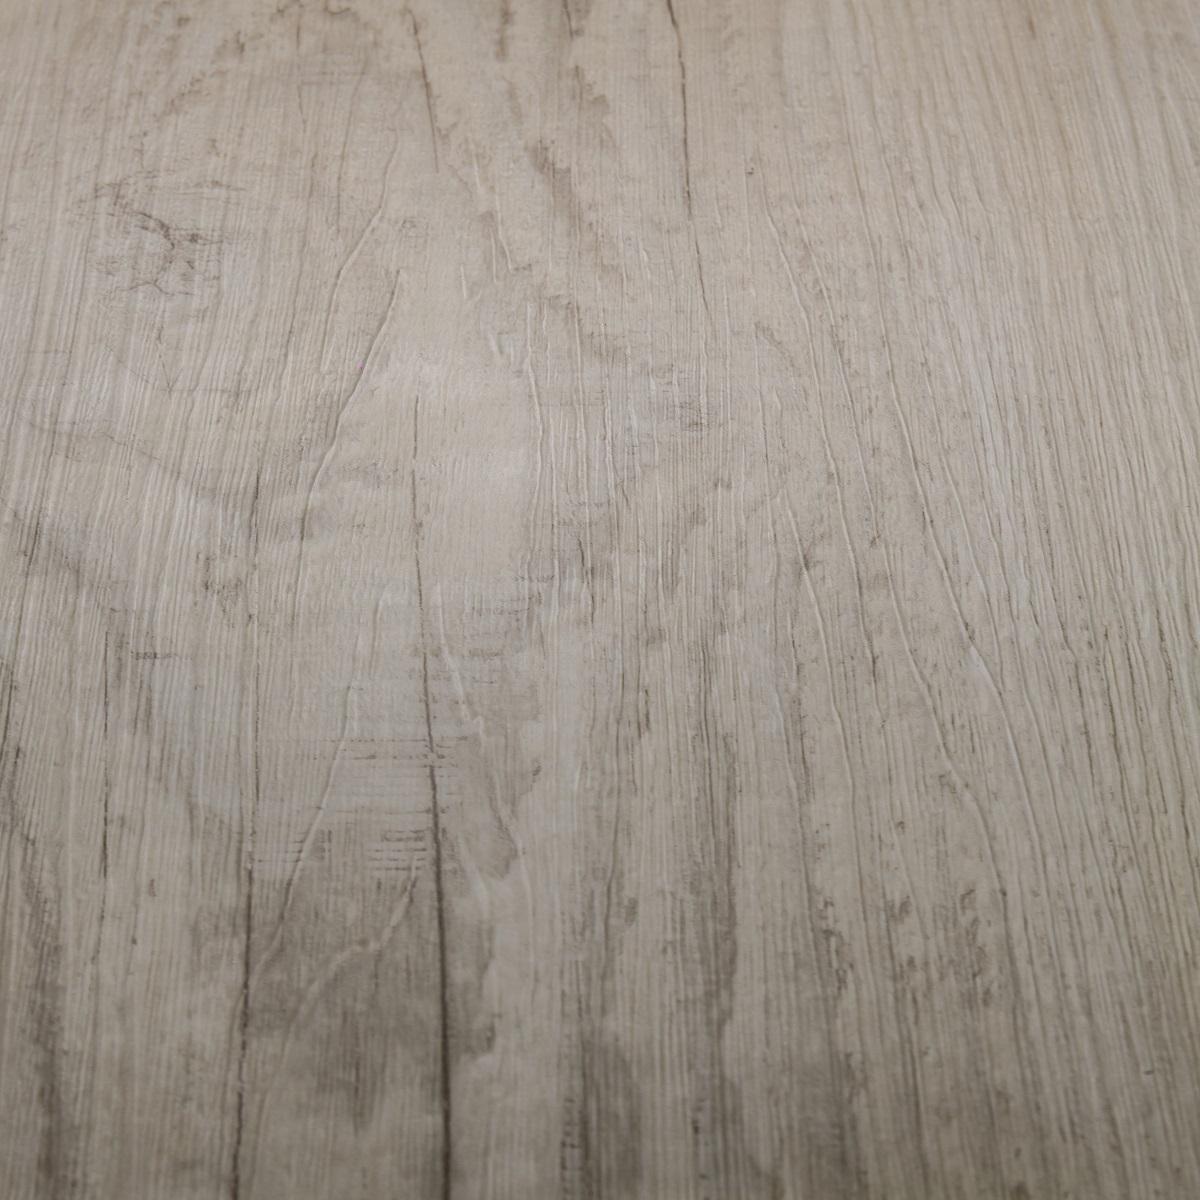 ECOCLICK 55 - Rustic Pine White